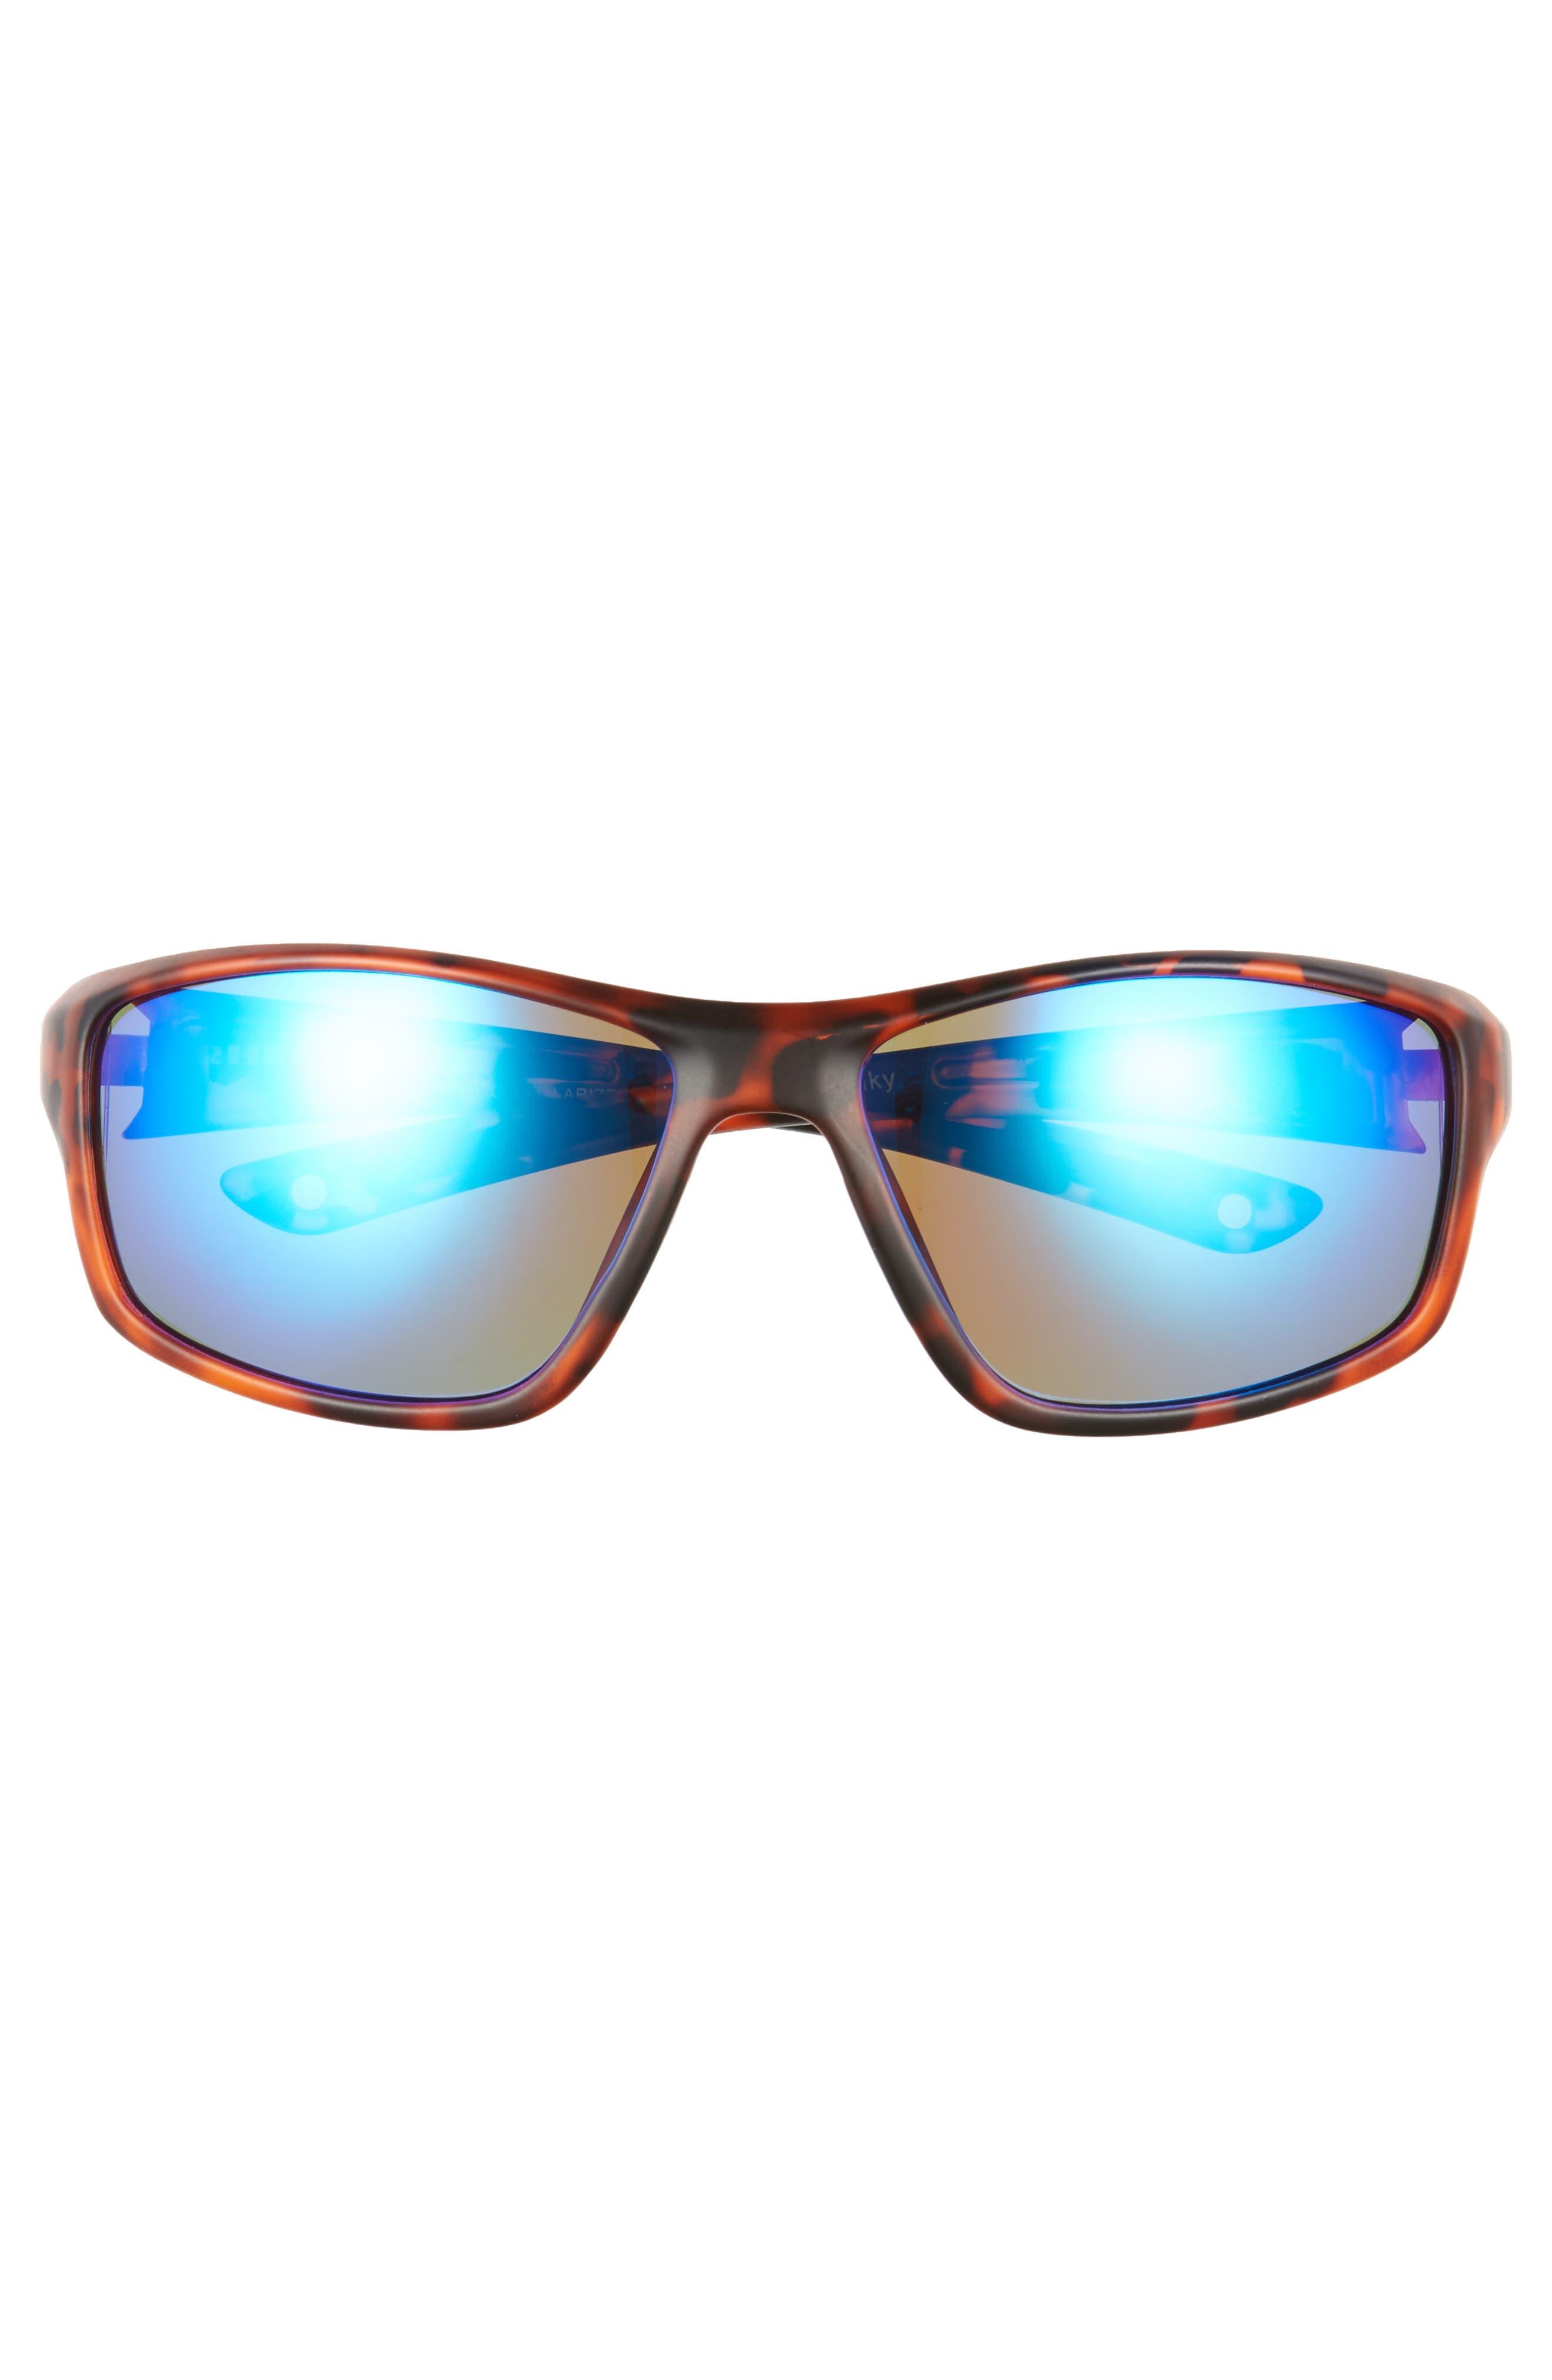 Eddies Floating 58mm Polarized Sunglasses,                             Alternate thumbnail 2, color,                             Tortoise / Marine